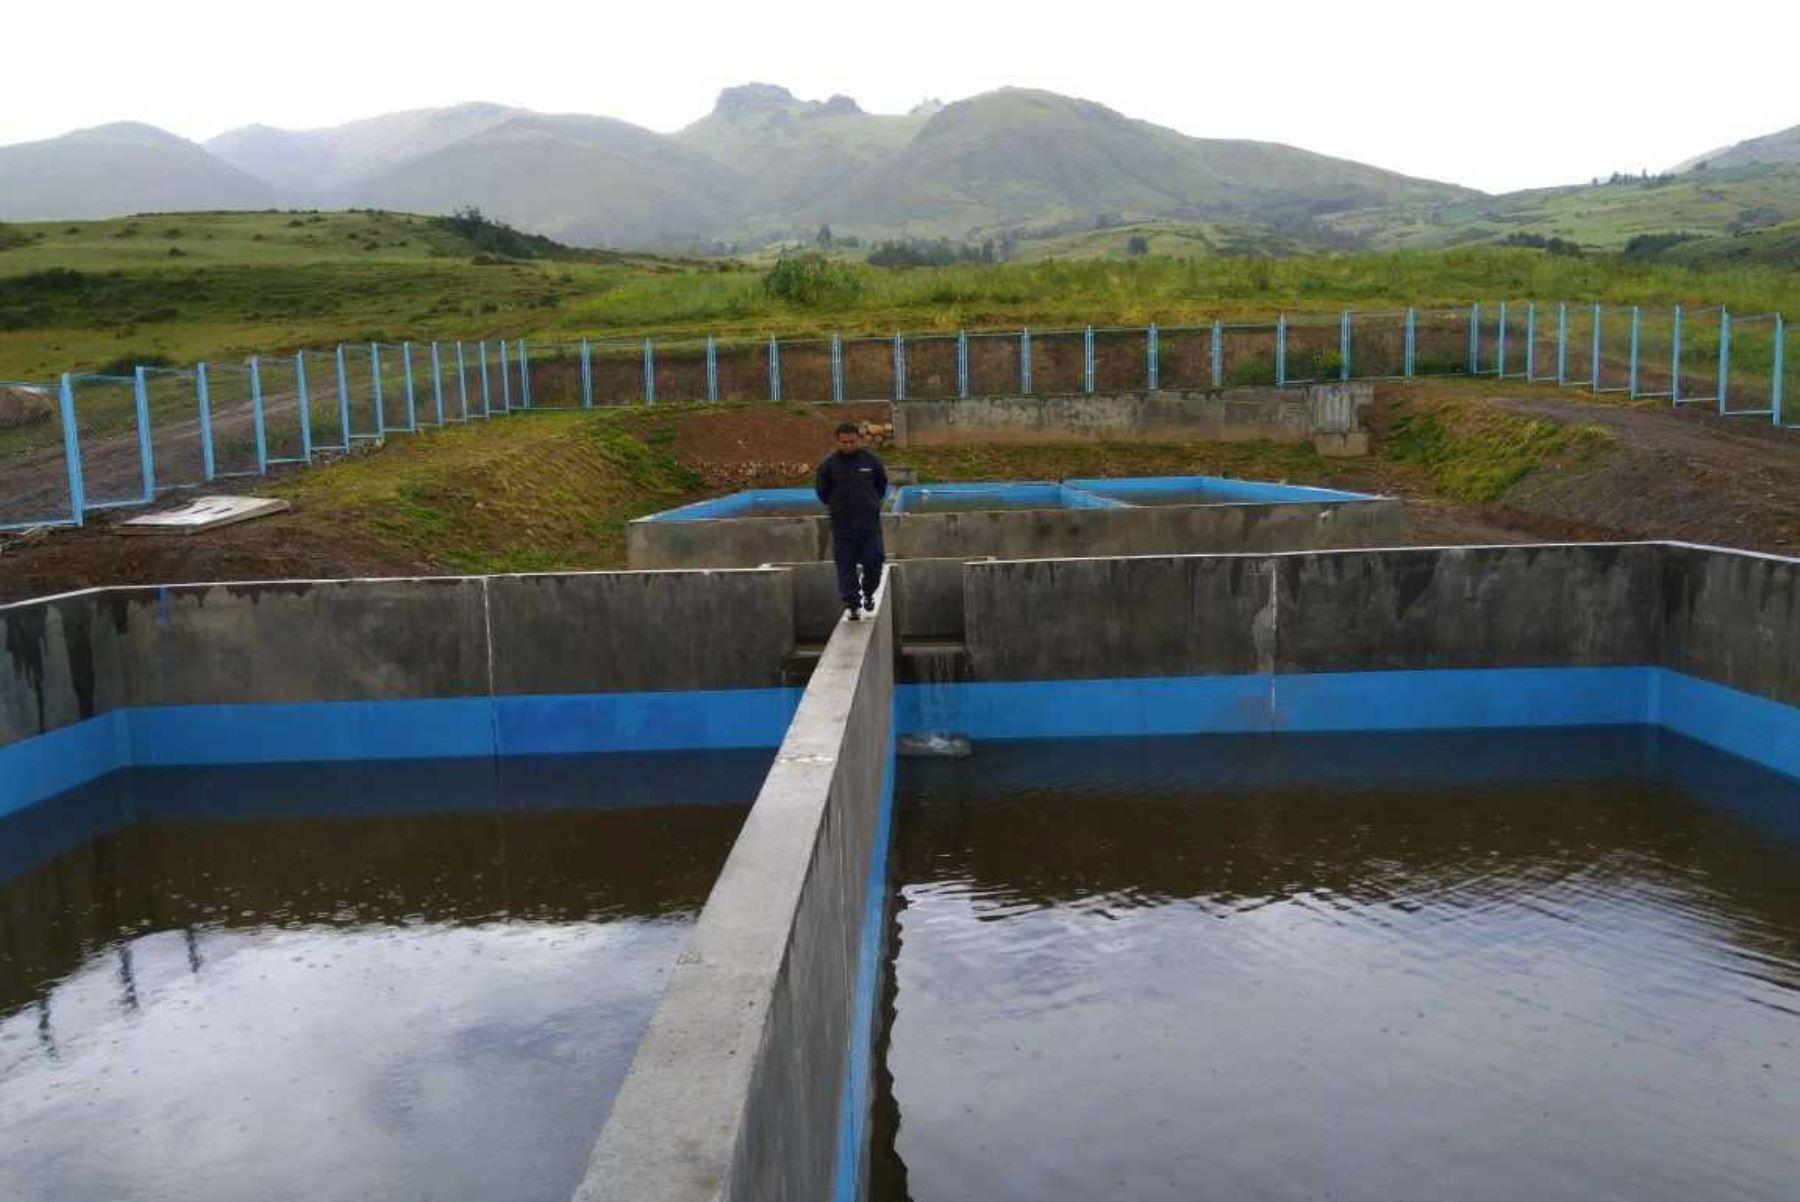 Japón dona US$ 428,000 para financiar cinco proyectos de infraestructura. ANDINA/Difusión